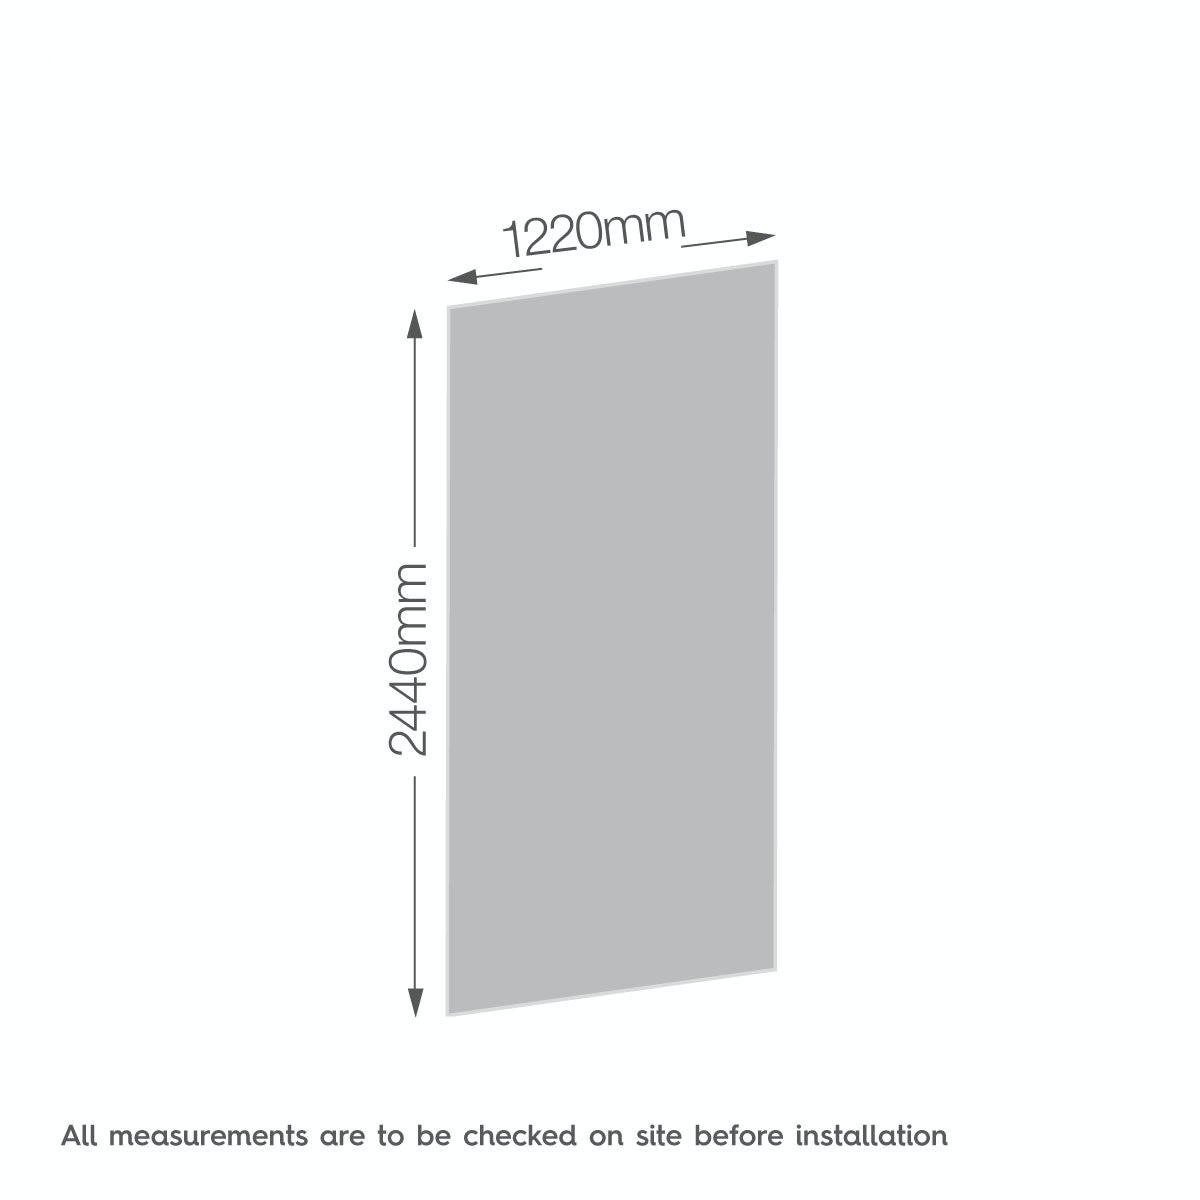 Dimensions for Zenolite plus fire acrylic shower wall panel 2440 x 1220